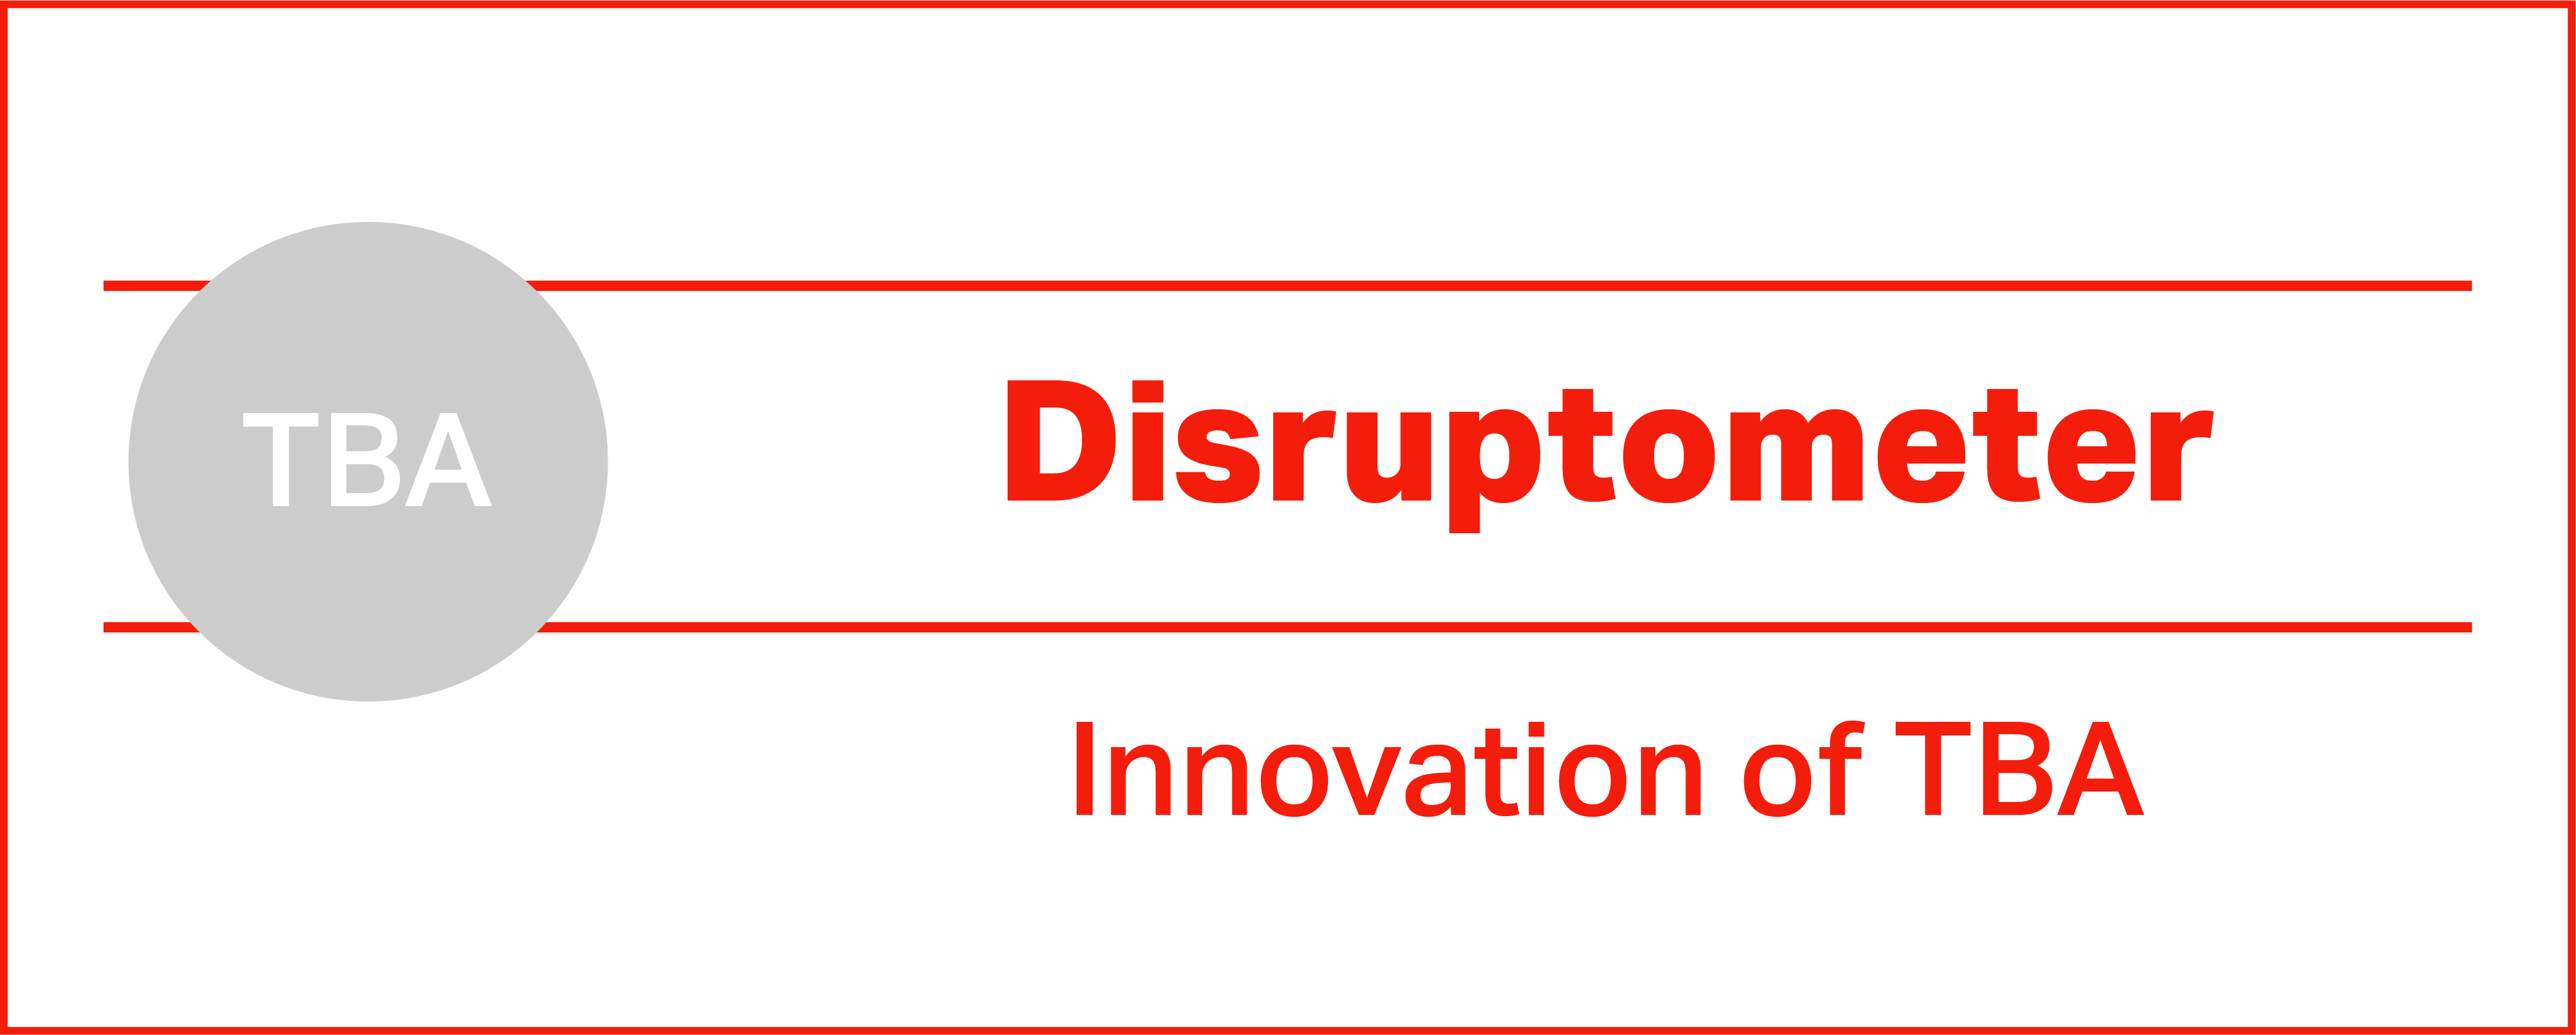 Disruptometer_1000x500-1.png